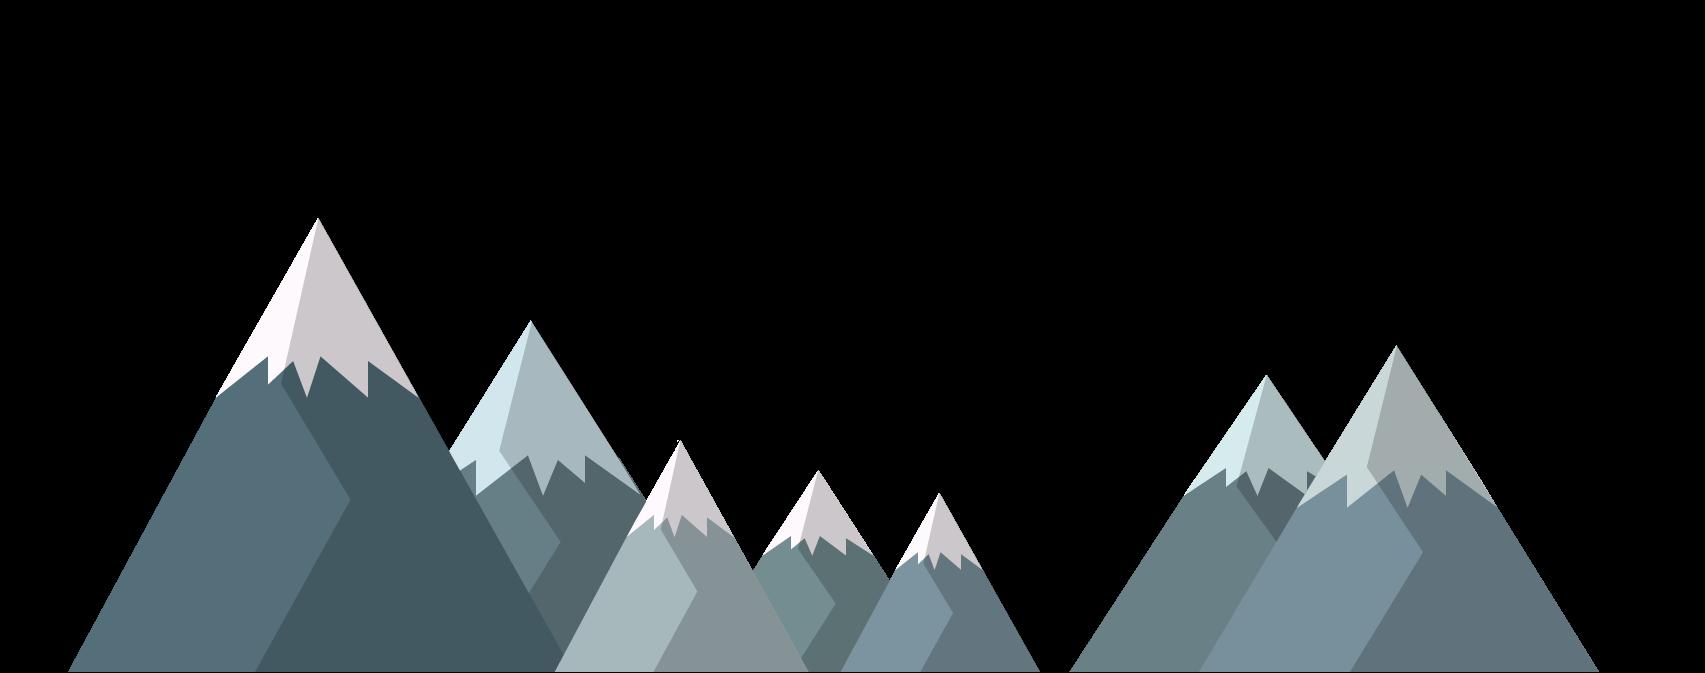 kisspng-mountain-graphic-design-clip-art-mountain-peak-5b26b5d7e0aae0.1417446715292635759203.png